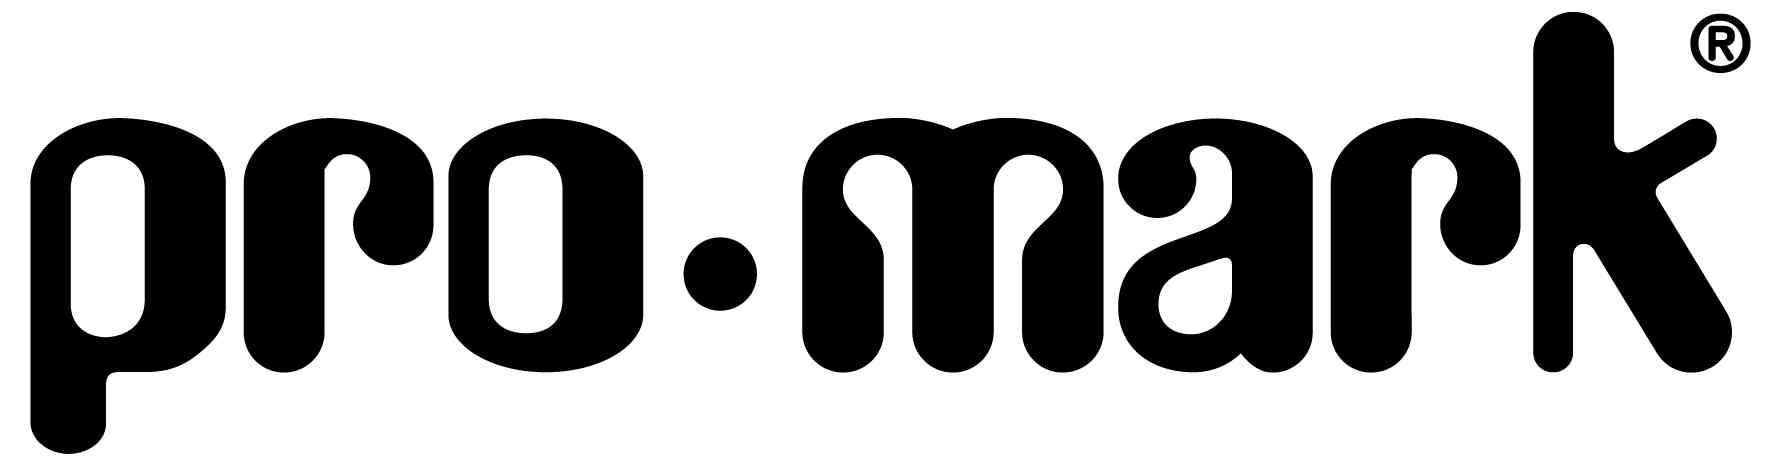 Pro-Mark